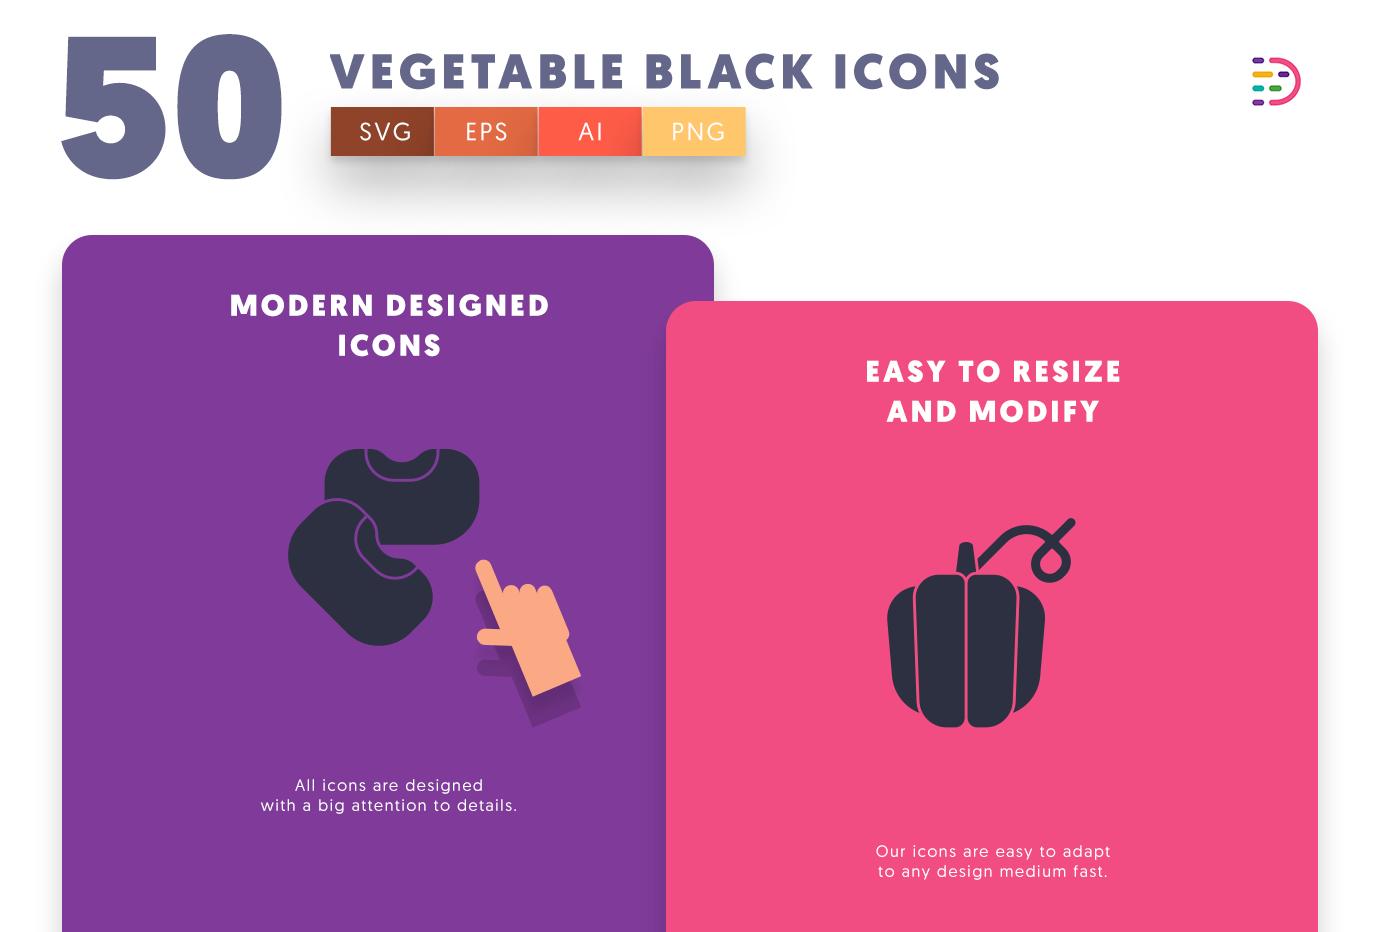 Vegetable Black icons png/svg/eps